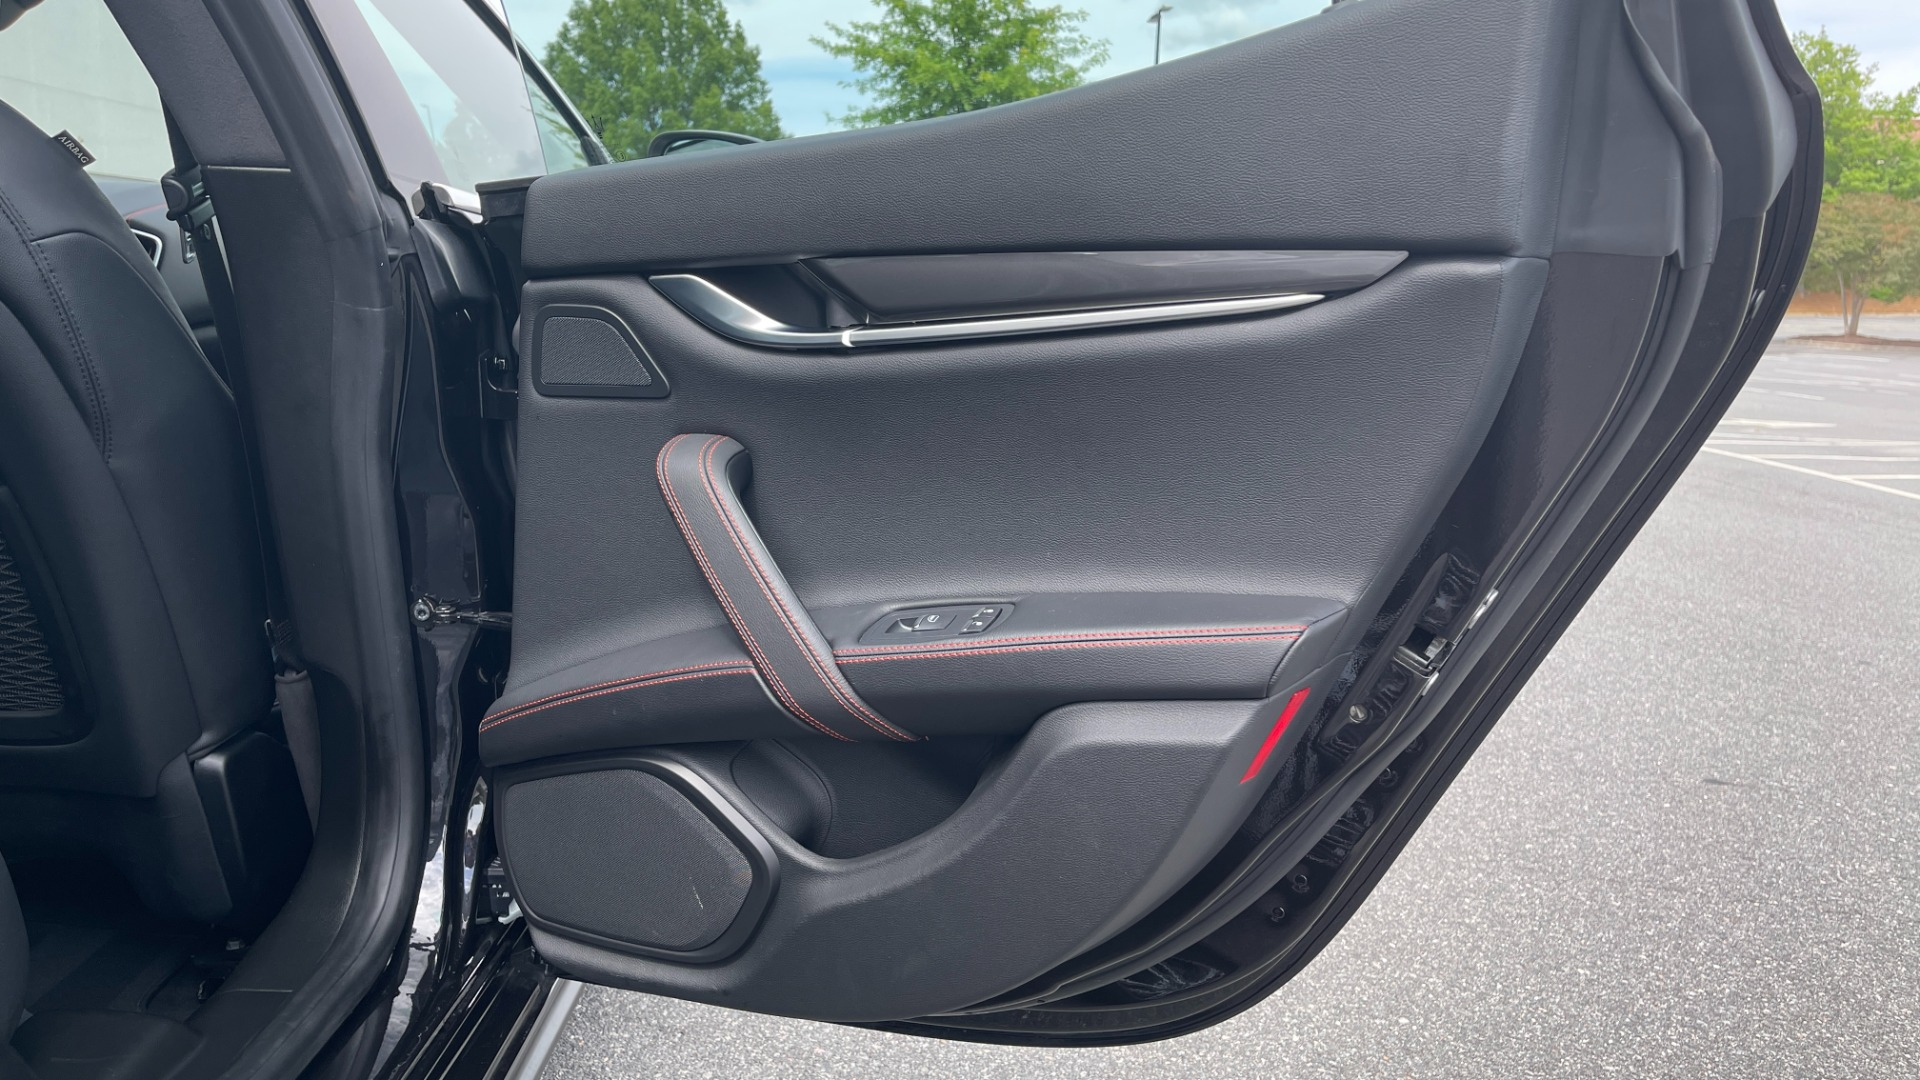 Used 2018 Maserati GHIBLI S Q4 SEDAN / AWD / 3.0L V6 / SUNROOF / NAV / REARVIEW for sale $51,995 at Formula Imports in Charlotte NC 28227 58